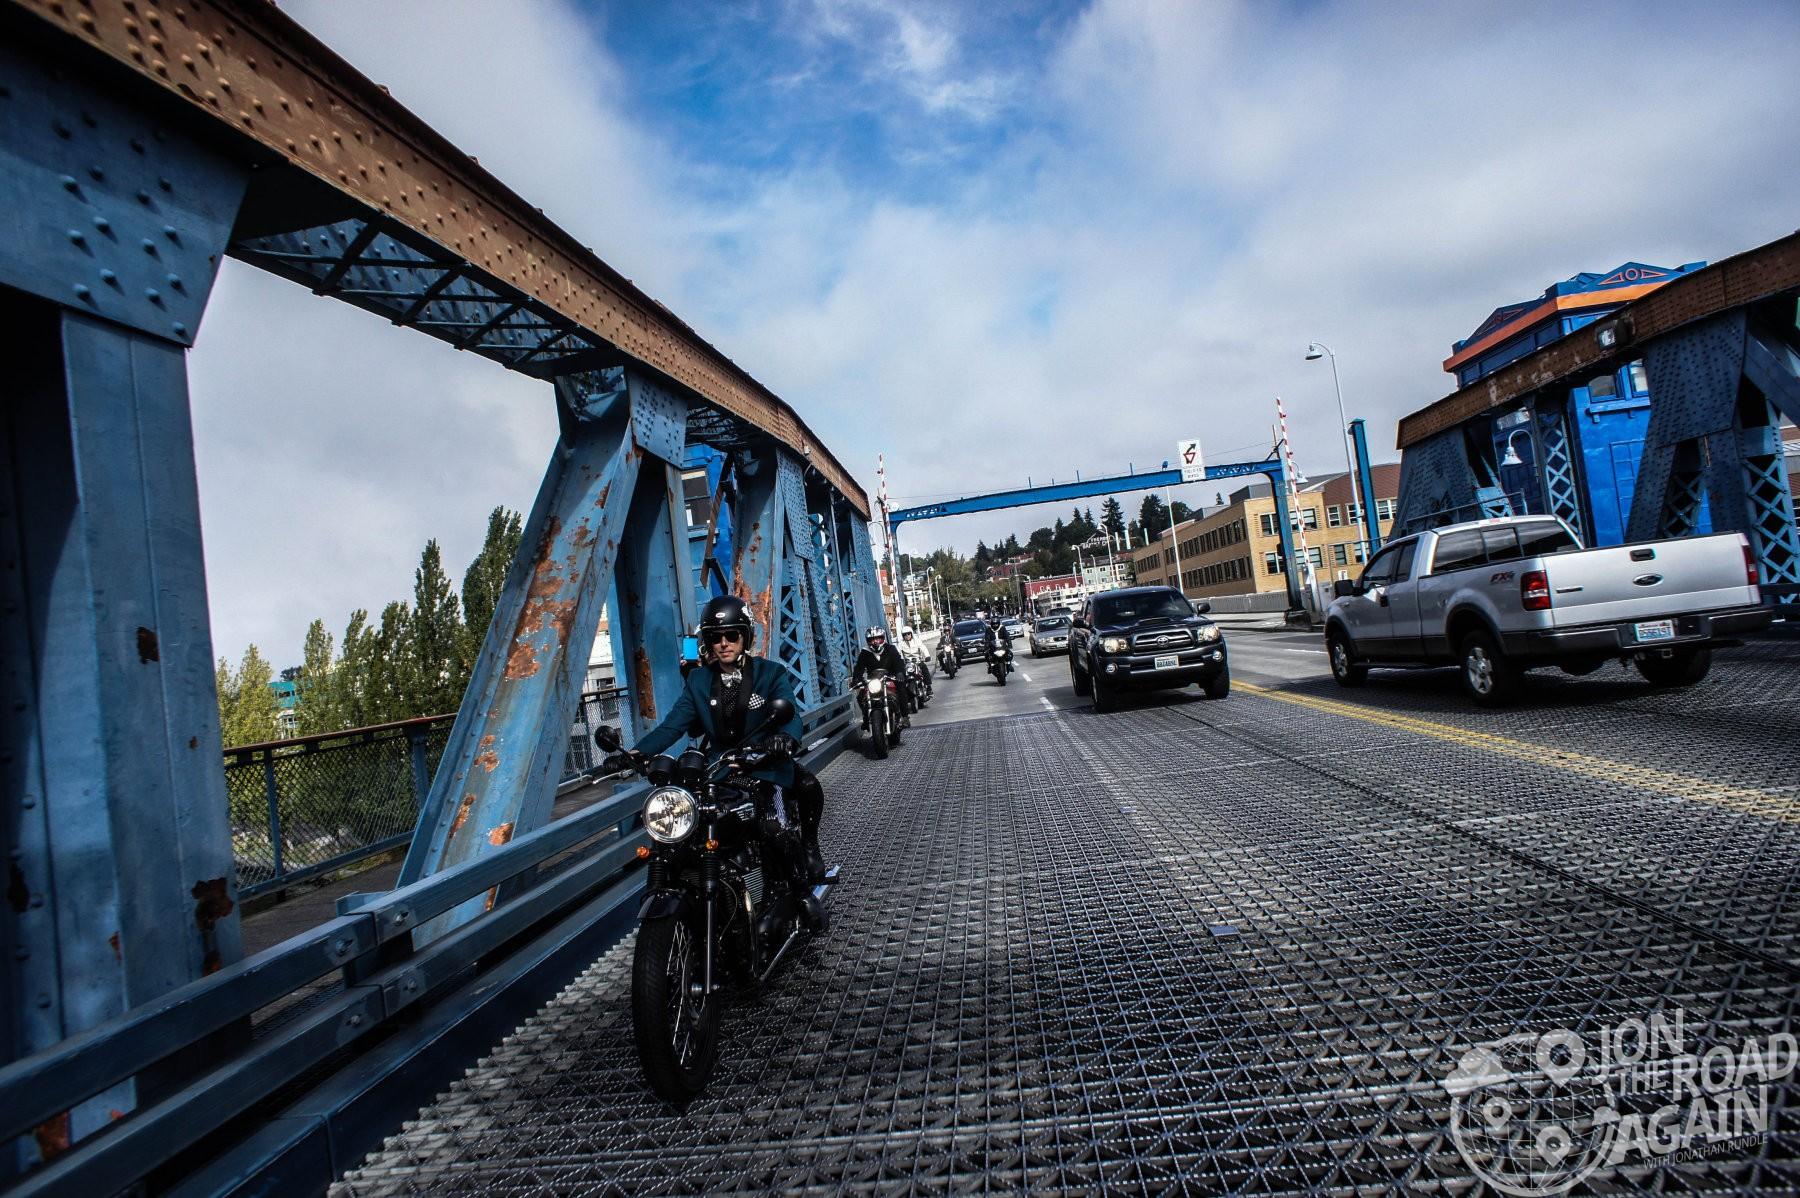 2014 Seattle Distinguished Gentlemen's Ride